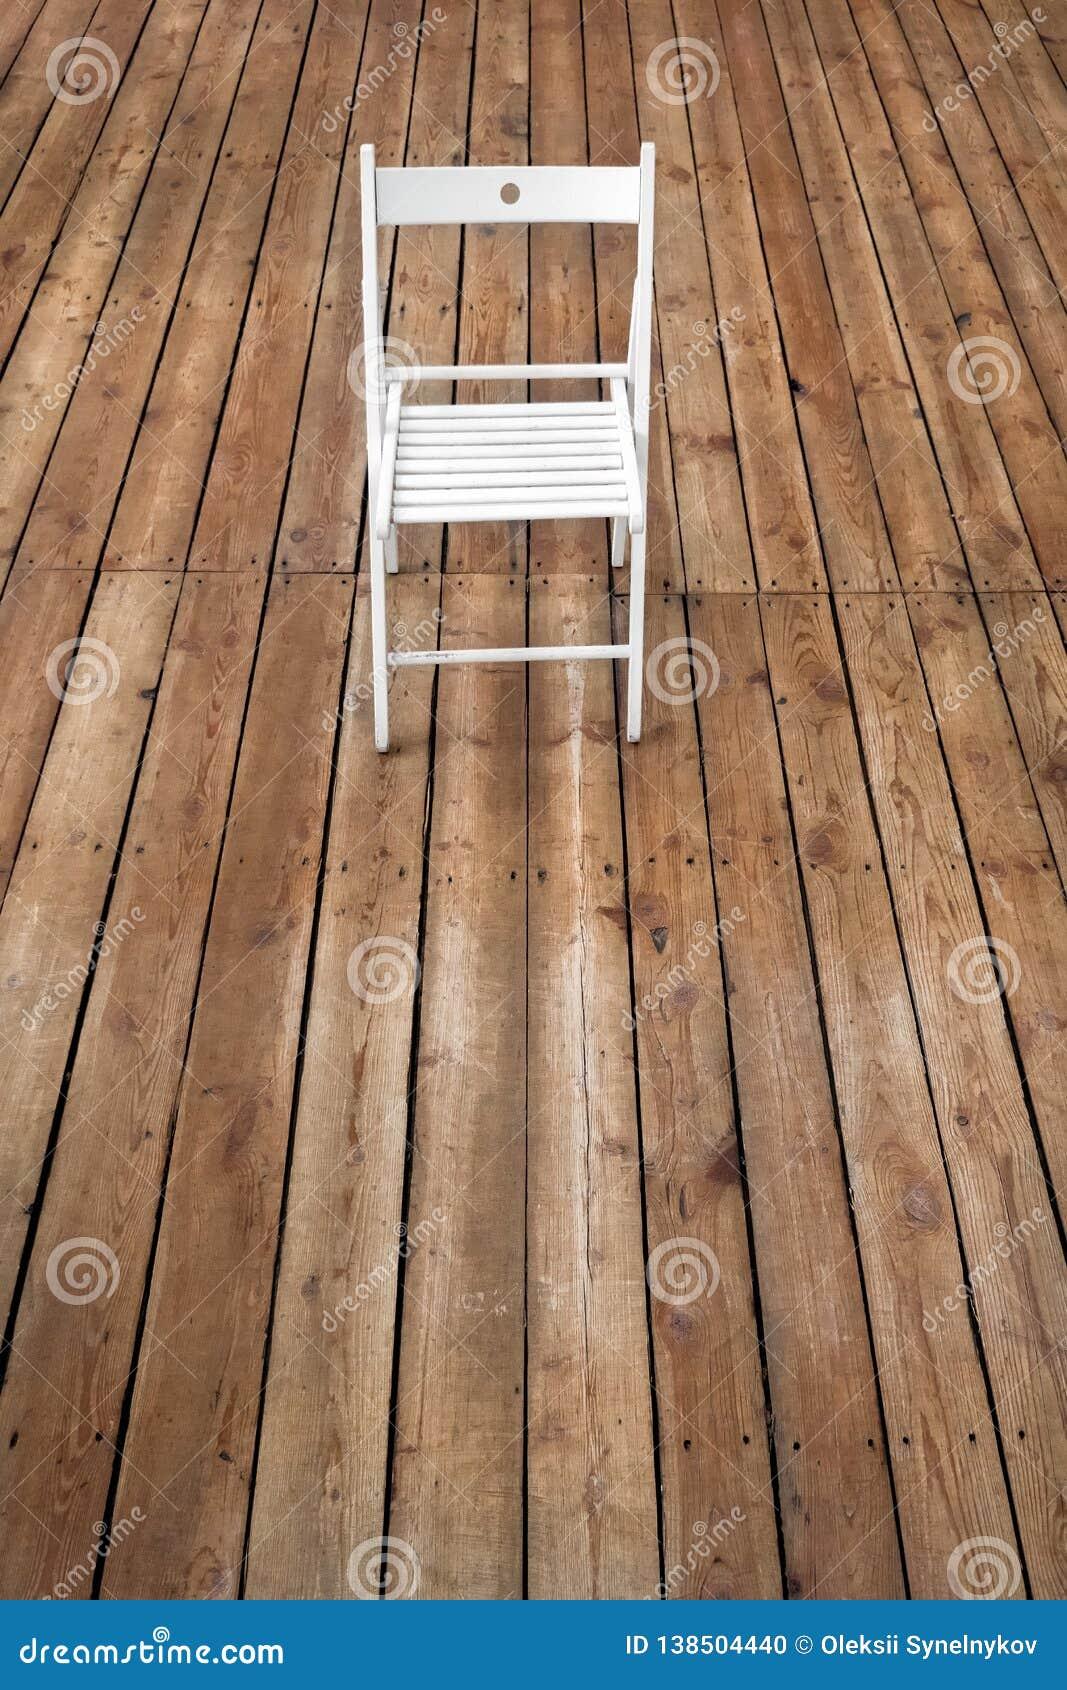 Chair and empty space on wooden floor. Single chair standing alone on wooden floor in empty room. Blank floor background. Studio